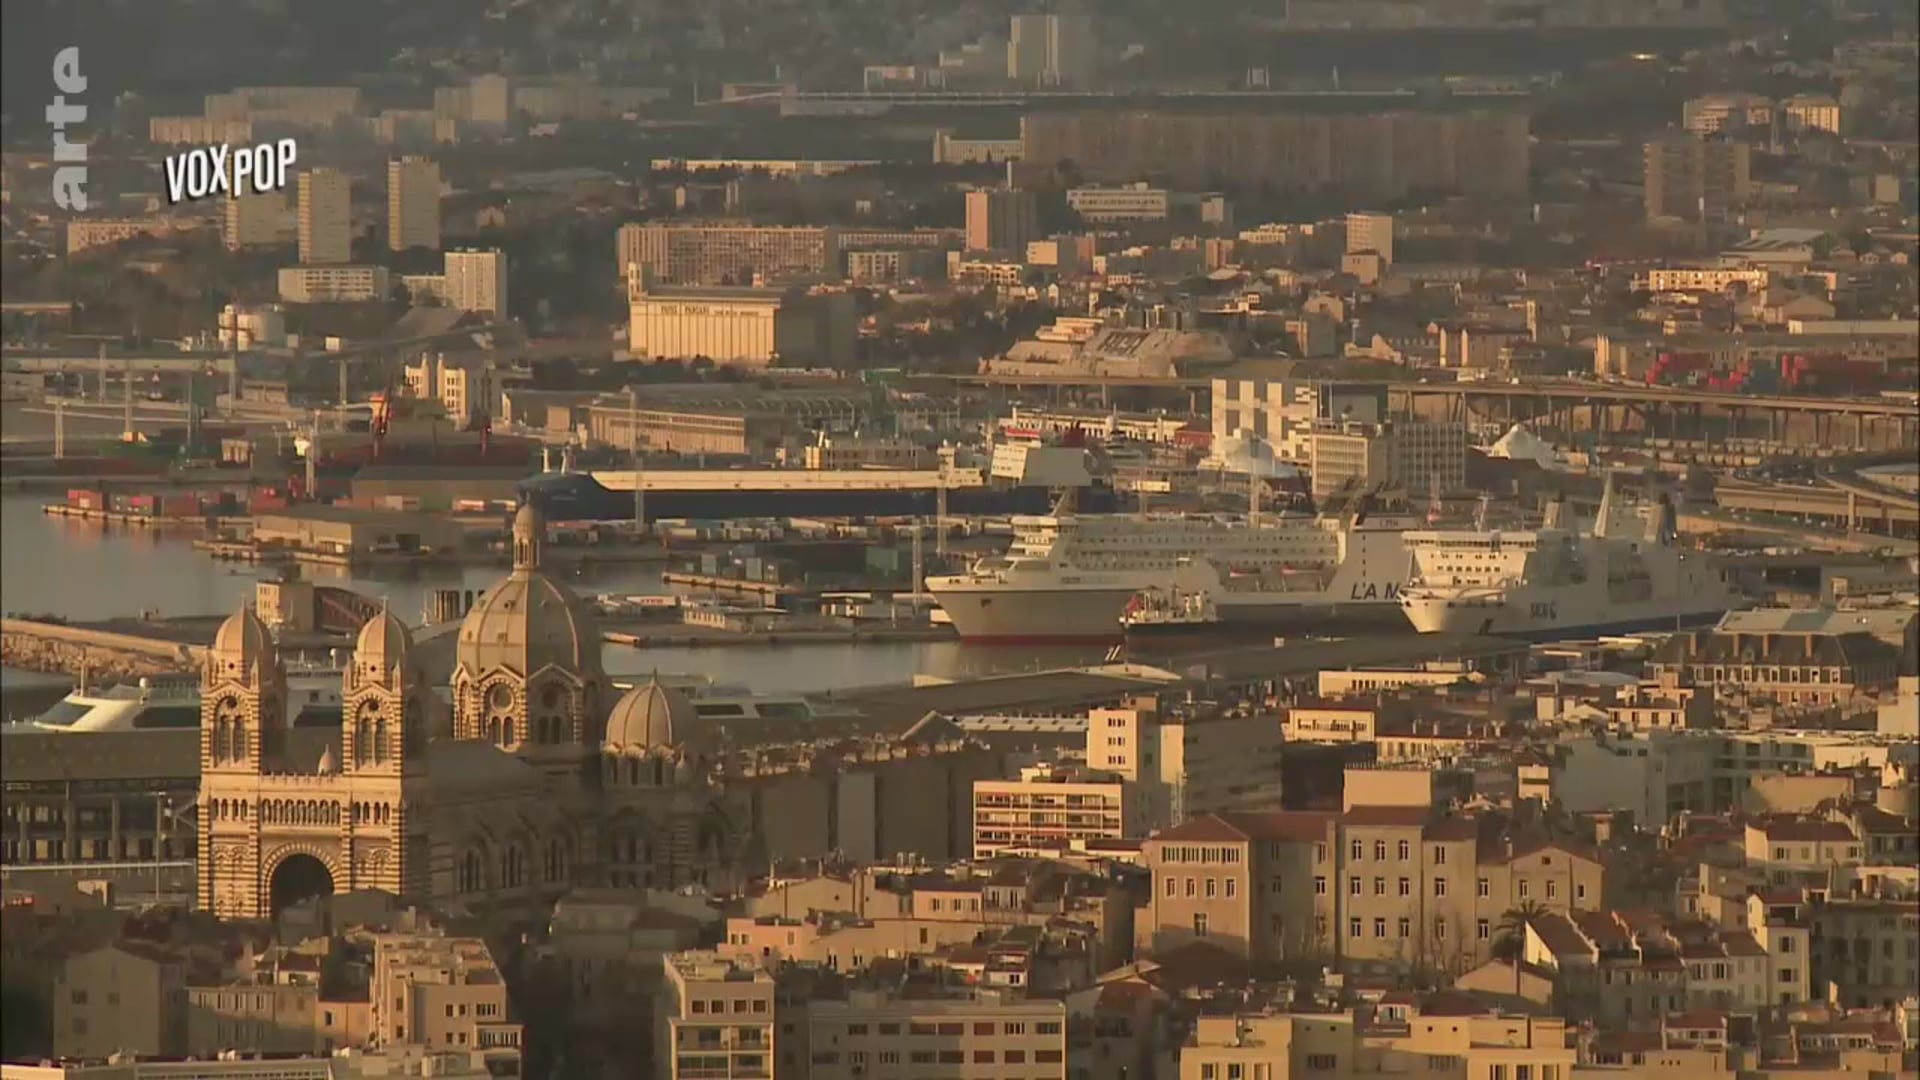 France Marseille étouffe ! - Vox pop ARTE